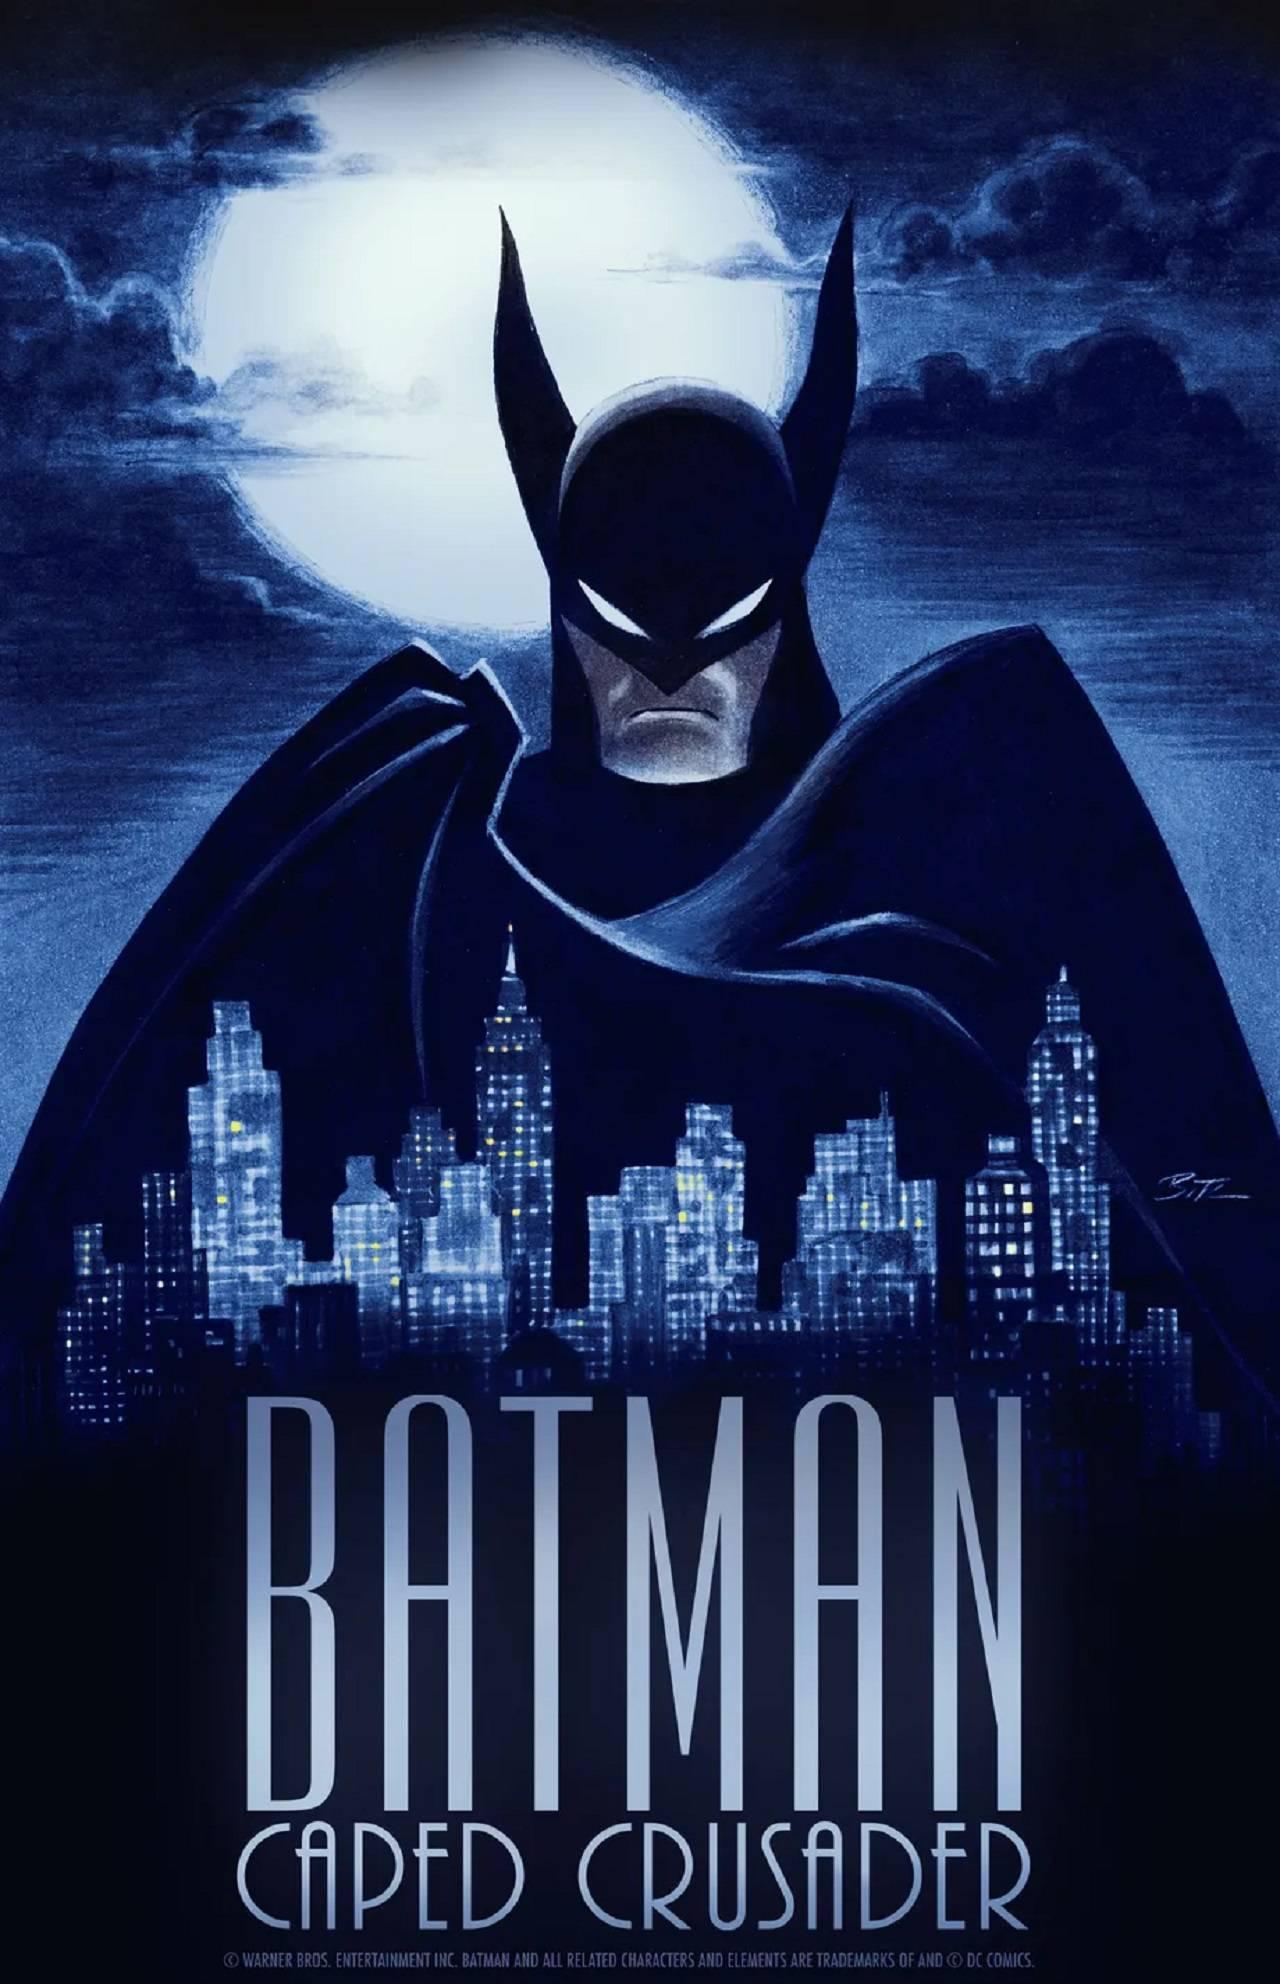 Batman Caped Crusader Nueva Serie Animada HBO Max